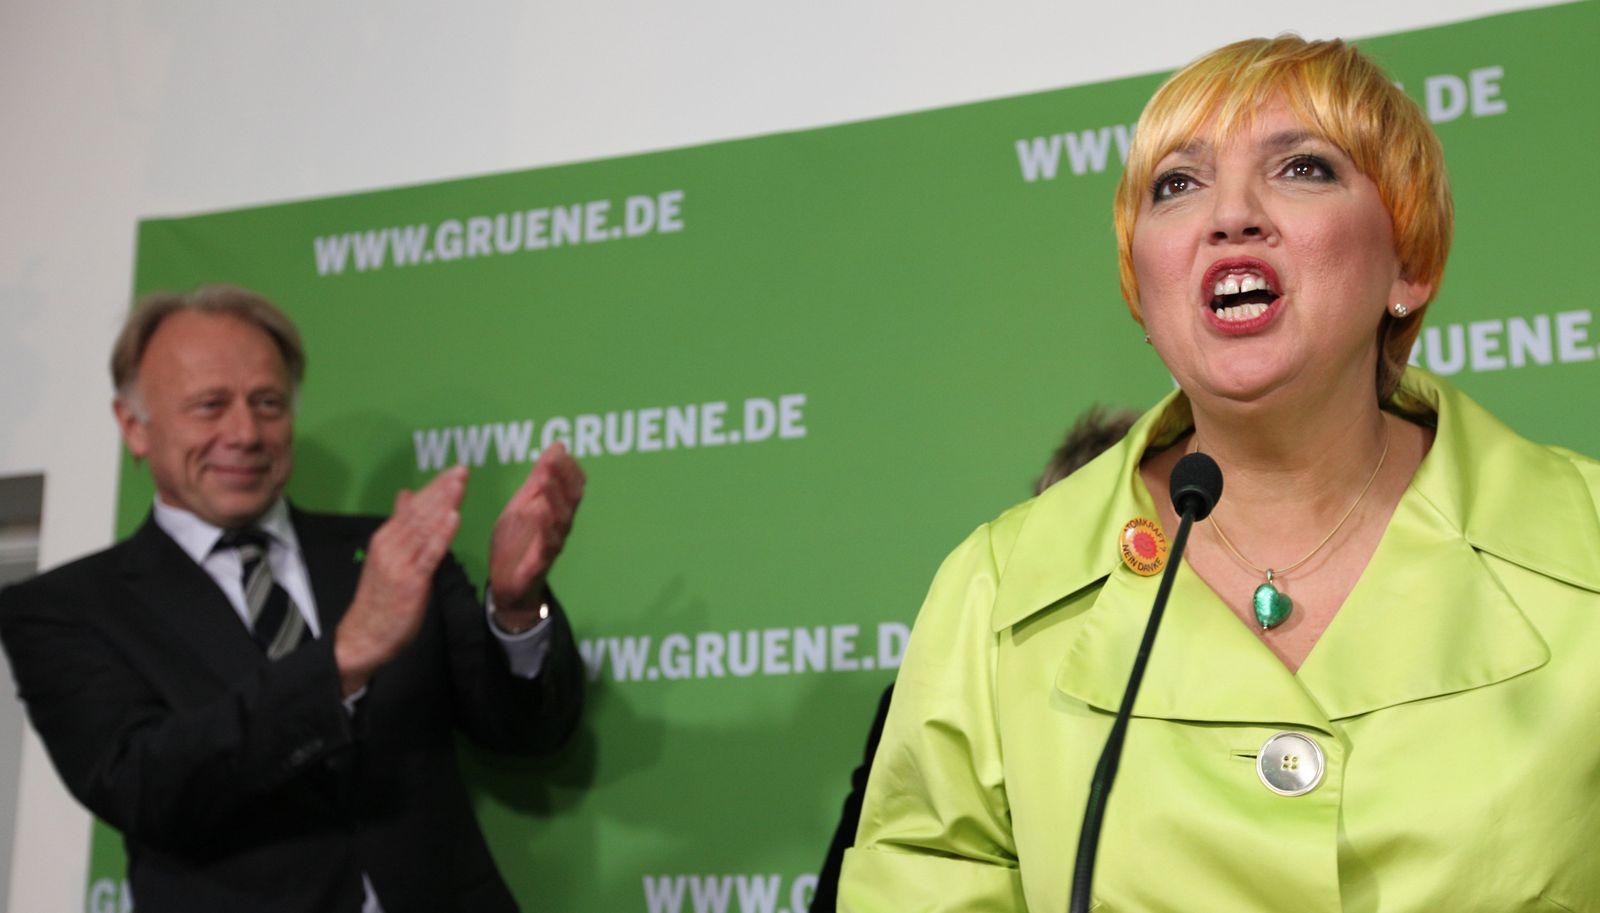 Landtagswahl/ Reaktionen/ Grüne/ Trittin/ Roth